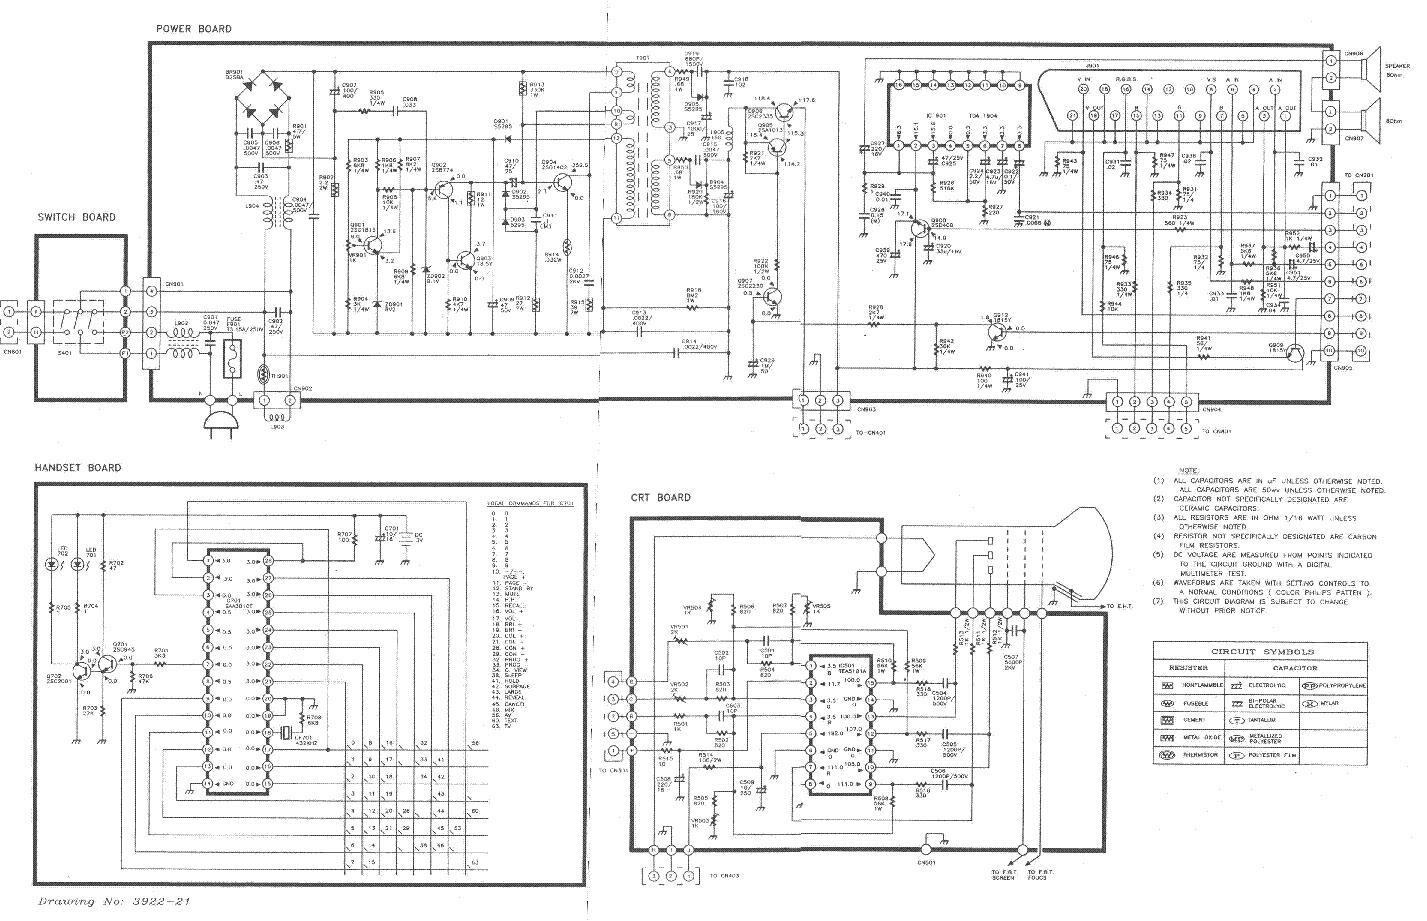 Skytronic Tv2130 Clatronic Ctv224 Sch Service Manual